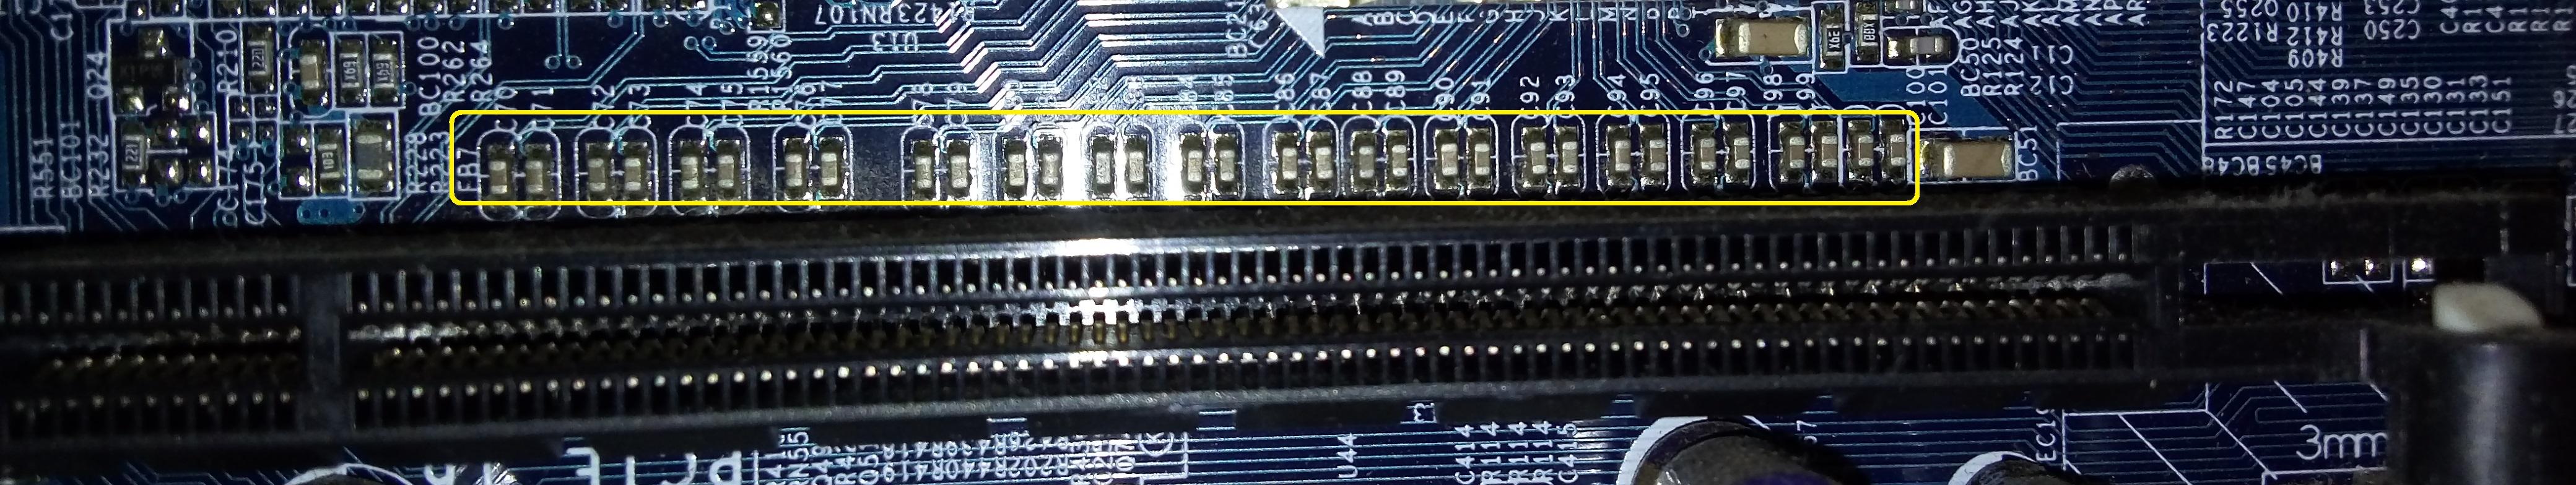 Capacitores PCIe - GBT GA-8i915GMF